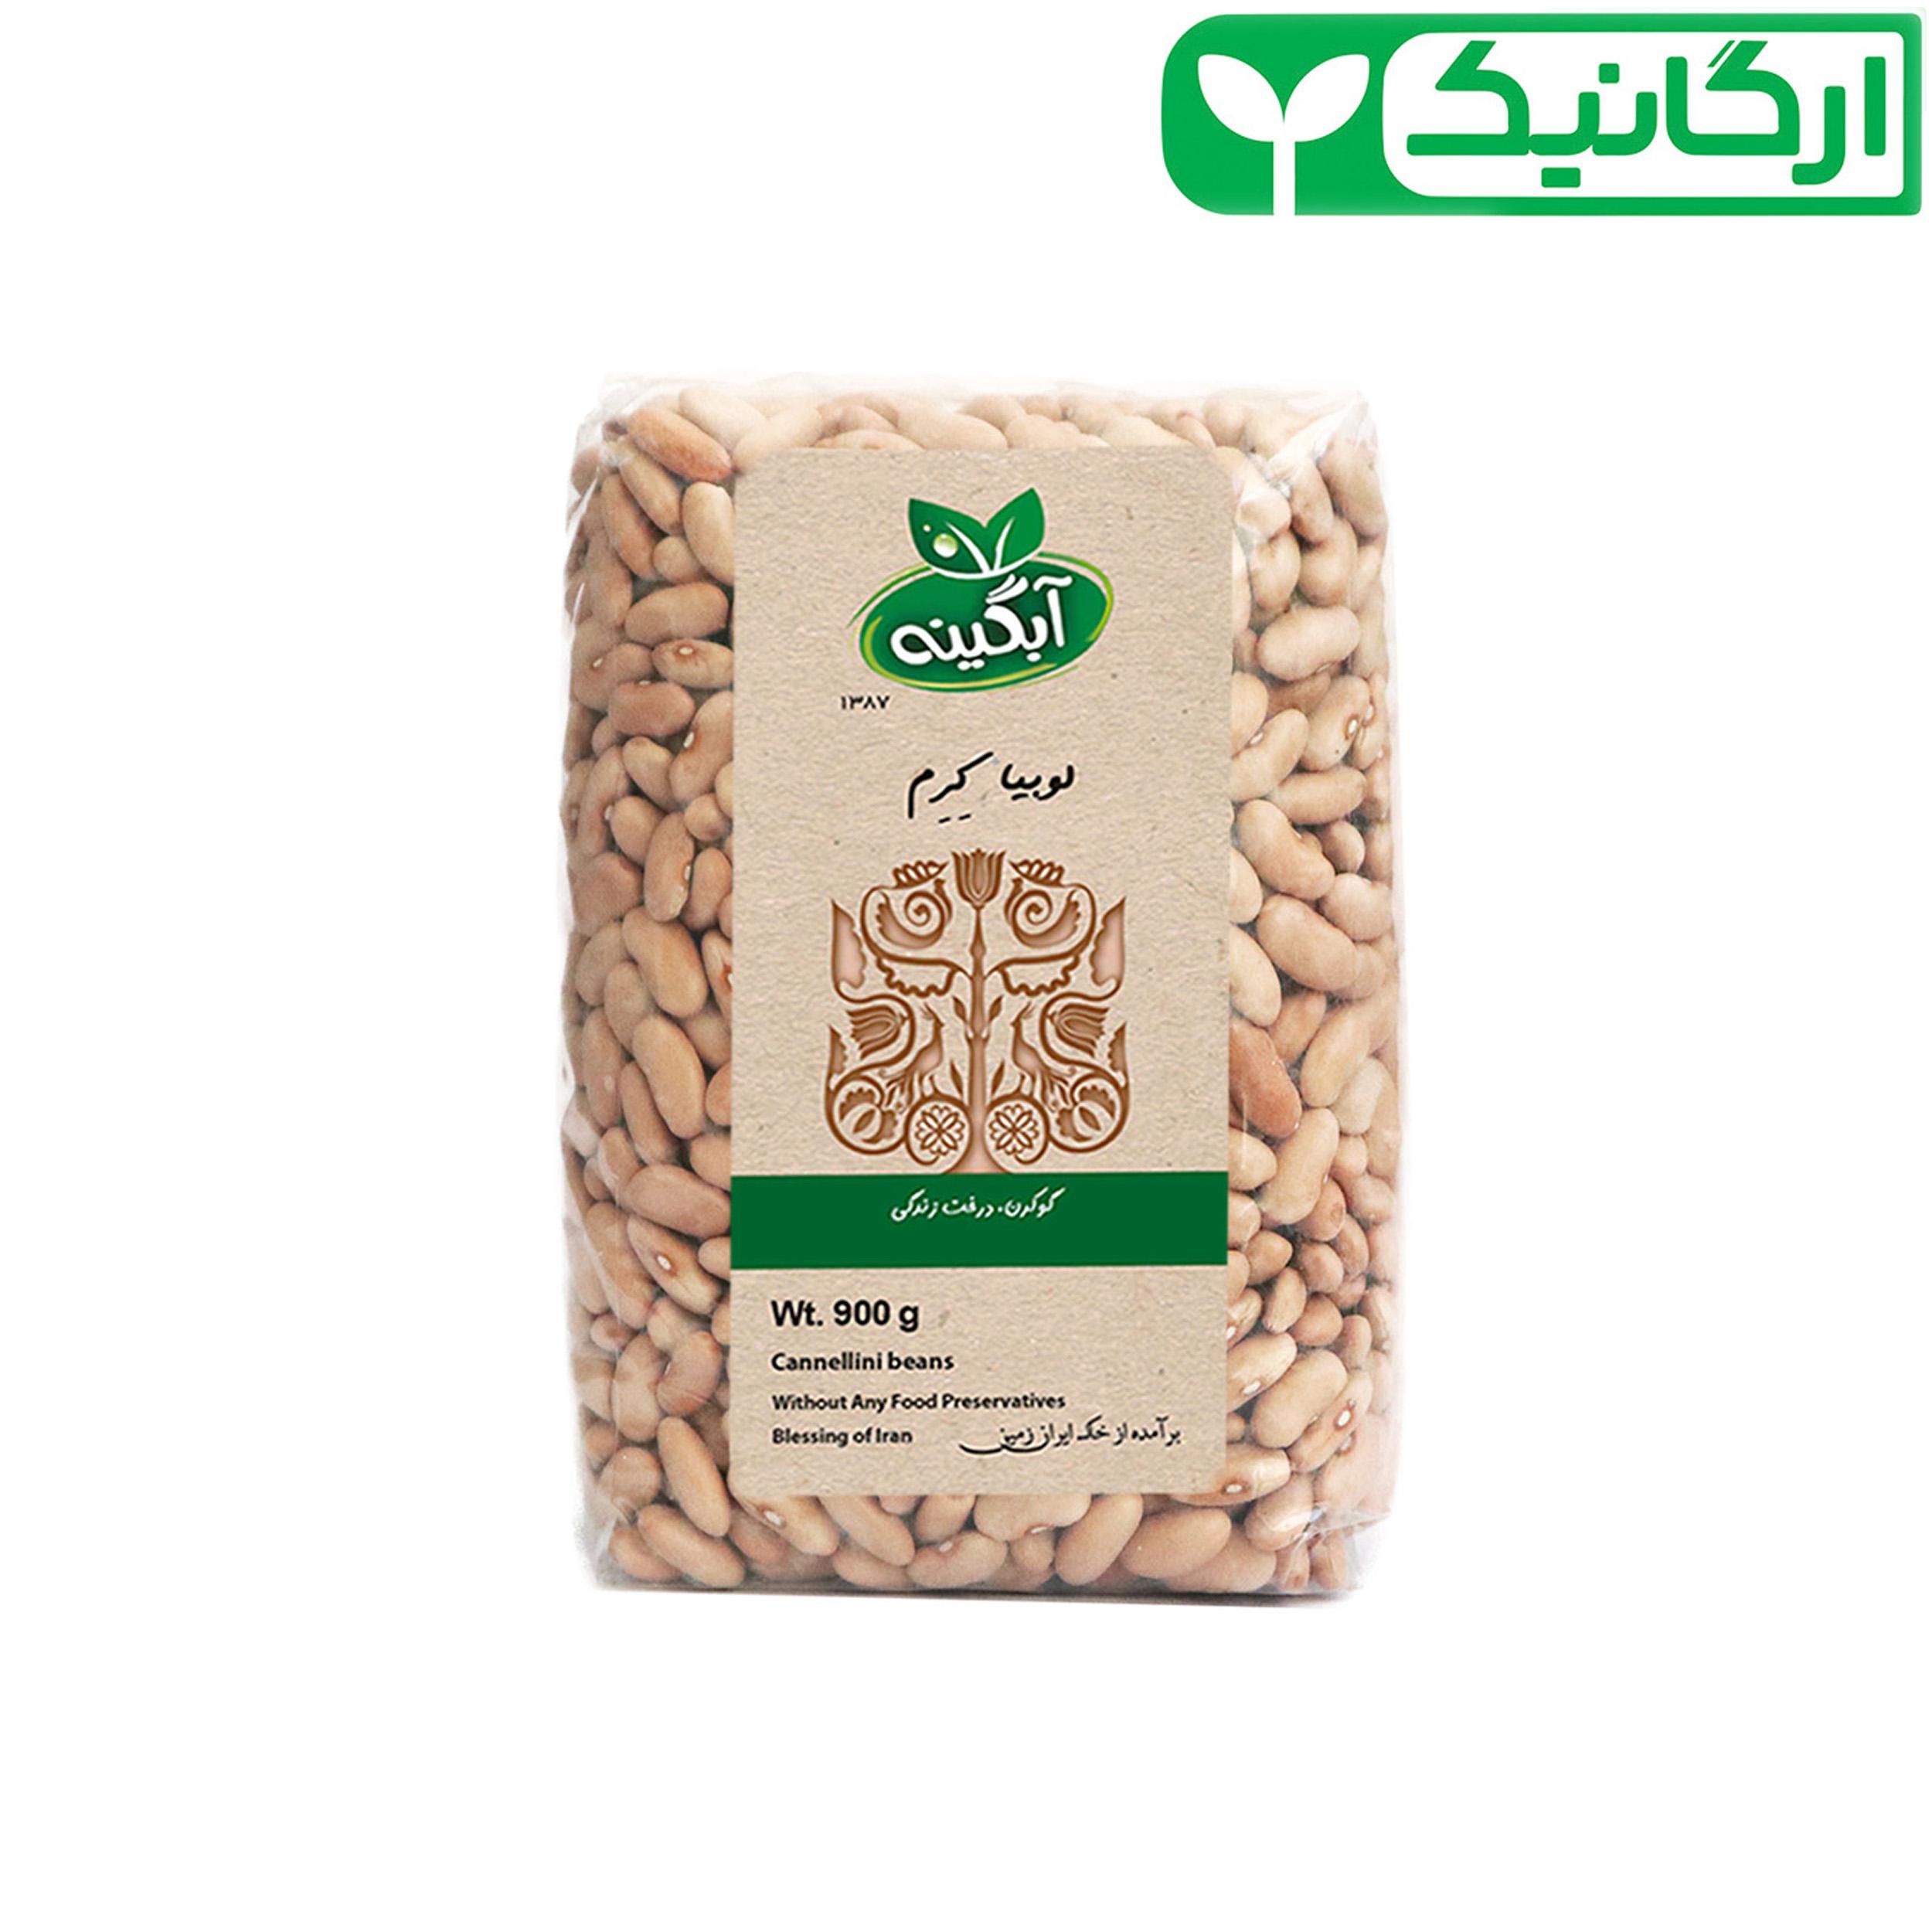 لوبیا کشاورزی ارگانیک آبگینه - 900 گرم